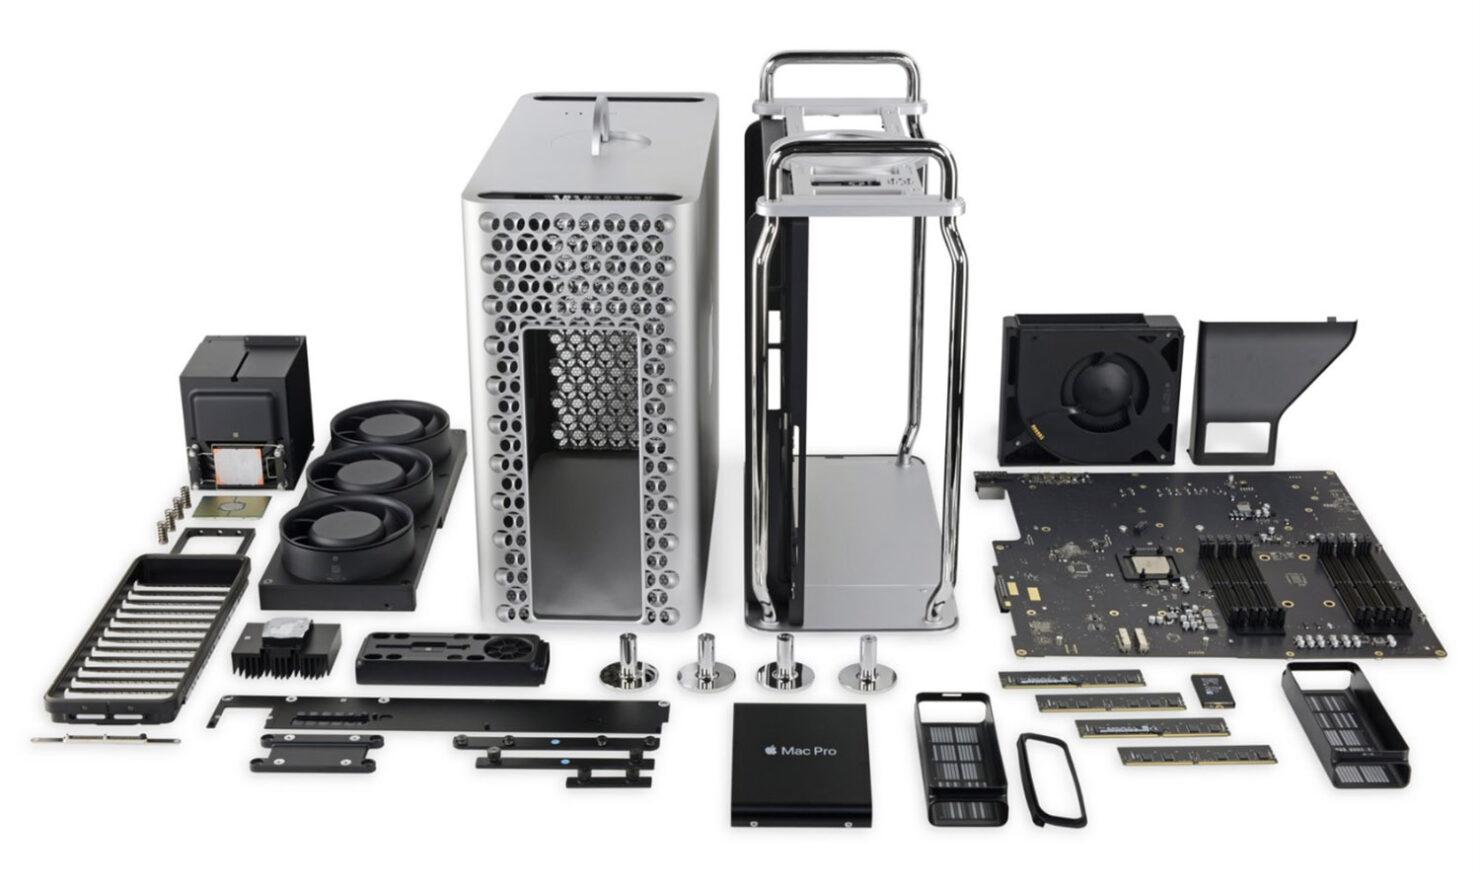 Mac Pro Teardown Receives Lots of Praise for Future Upgrading, Repairs